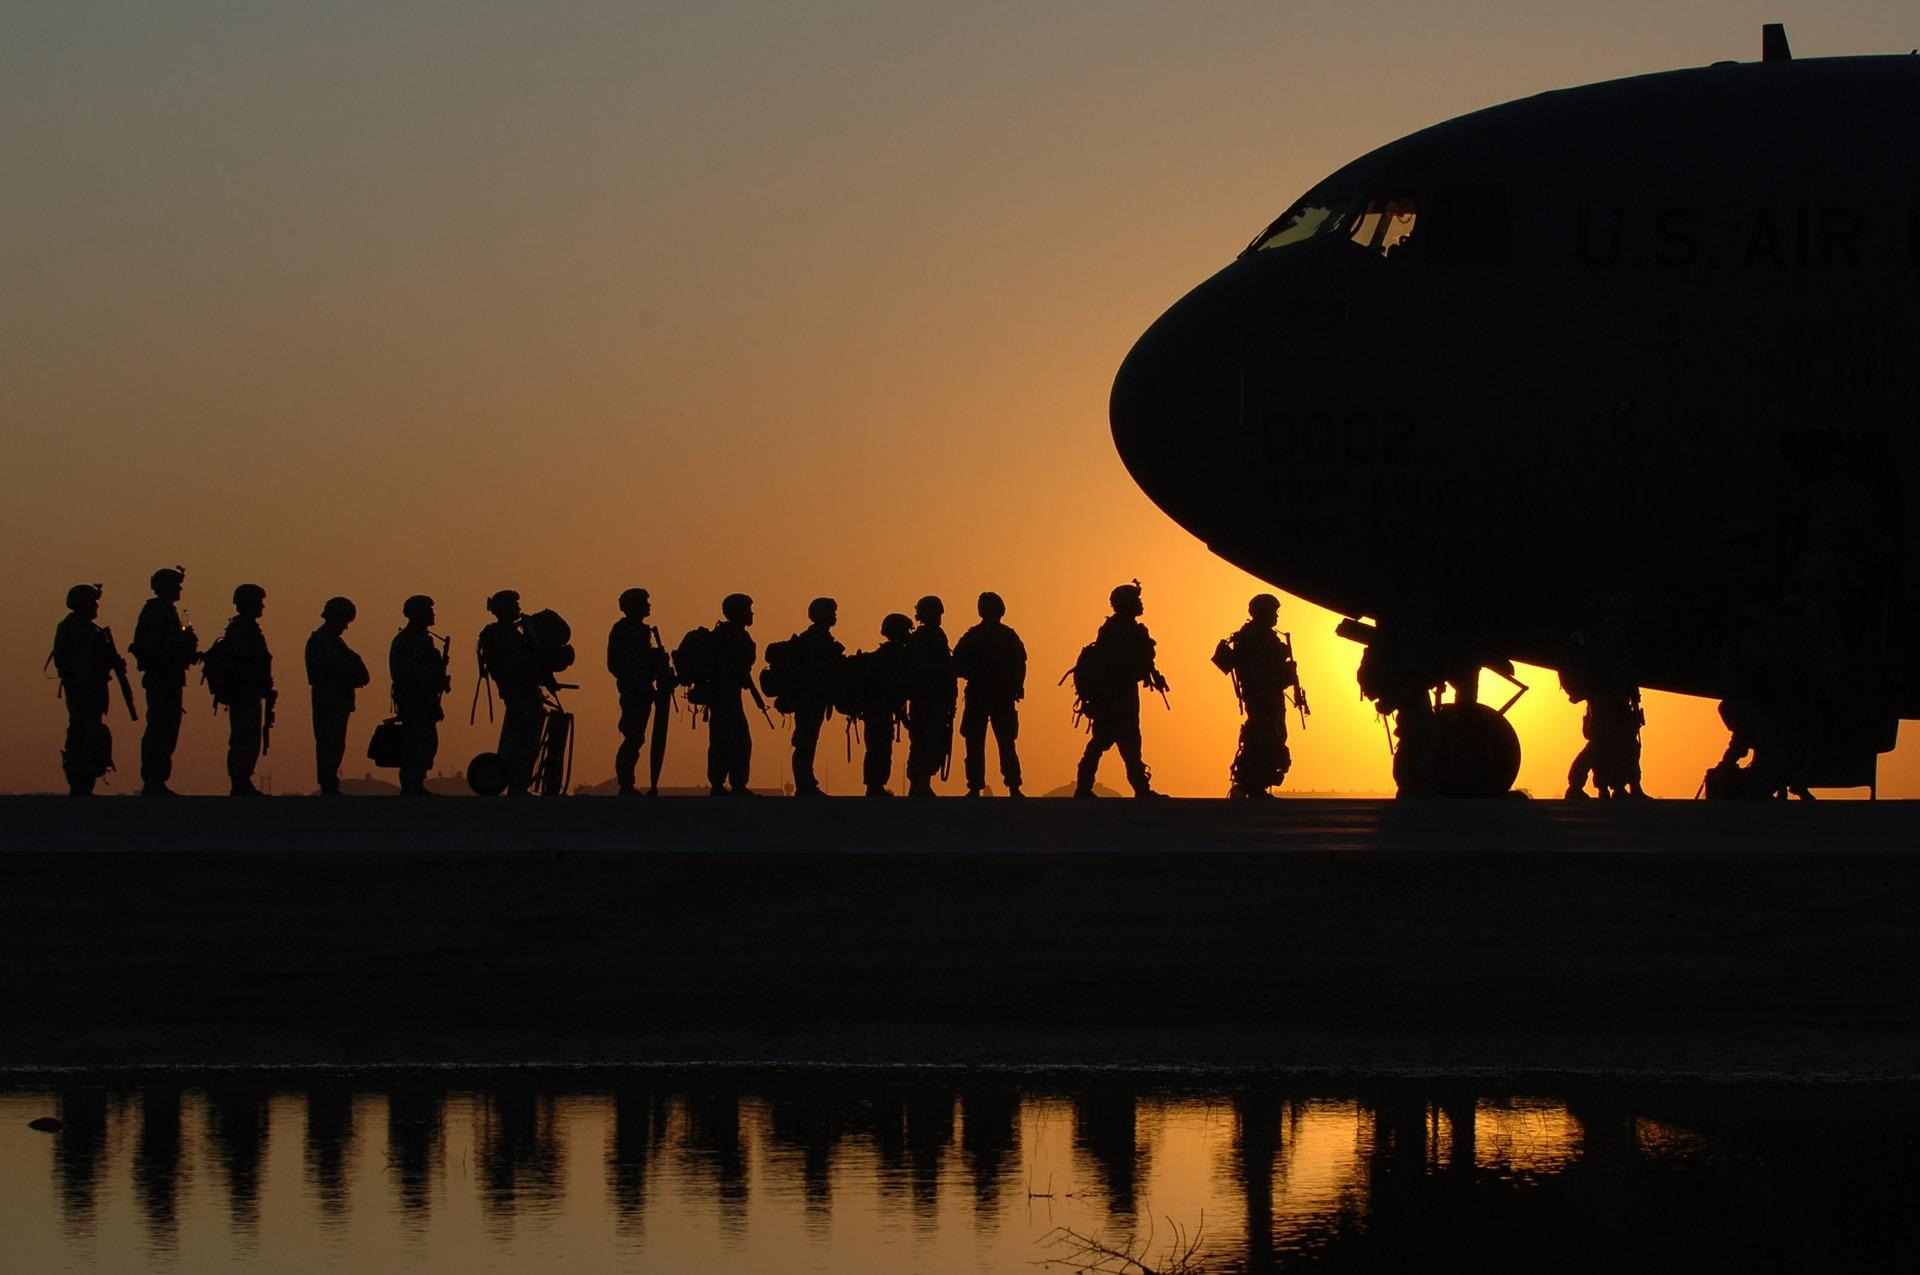 us-army-379036_1920.jpg